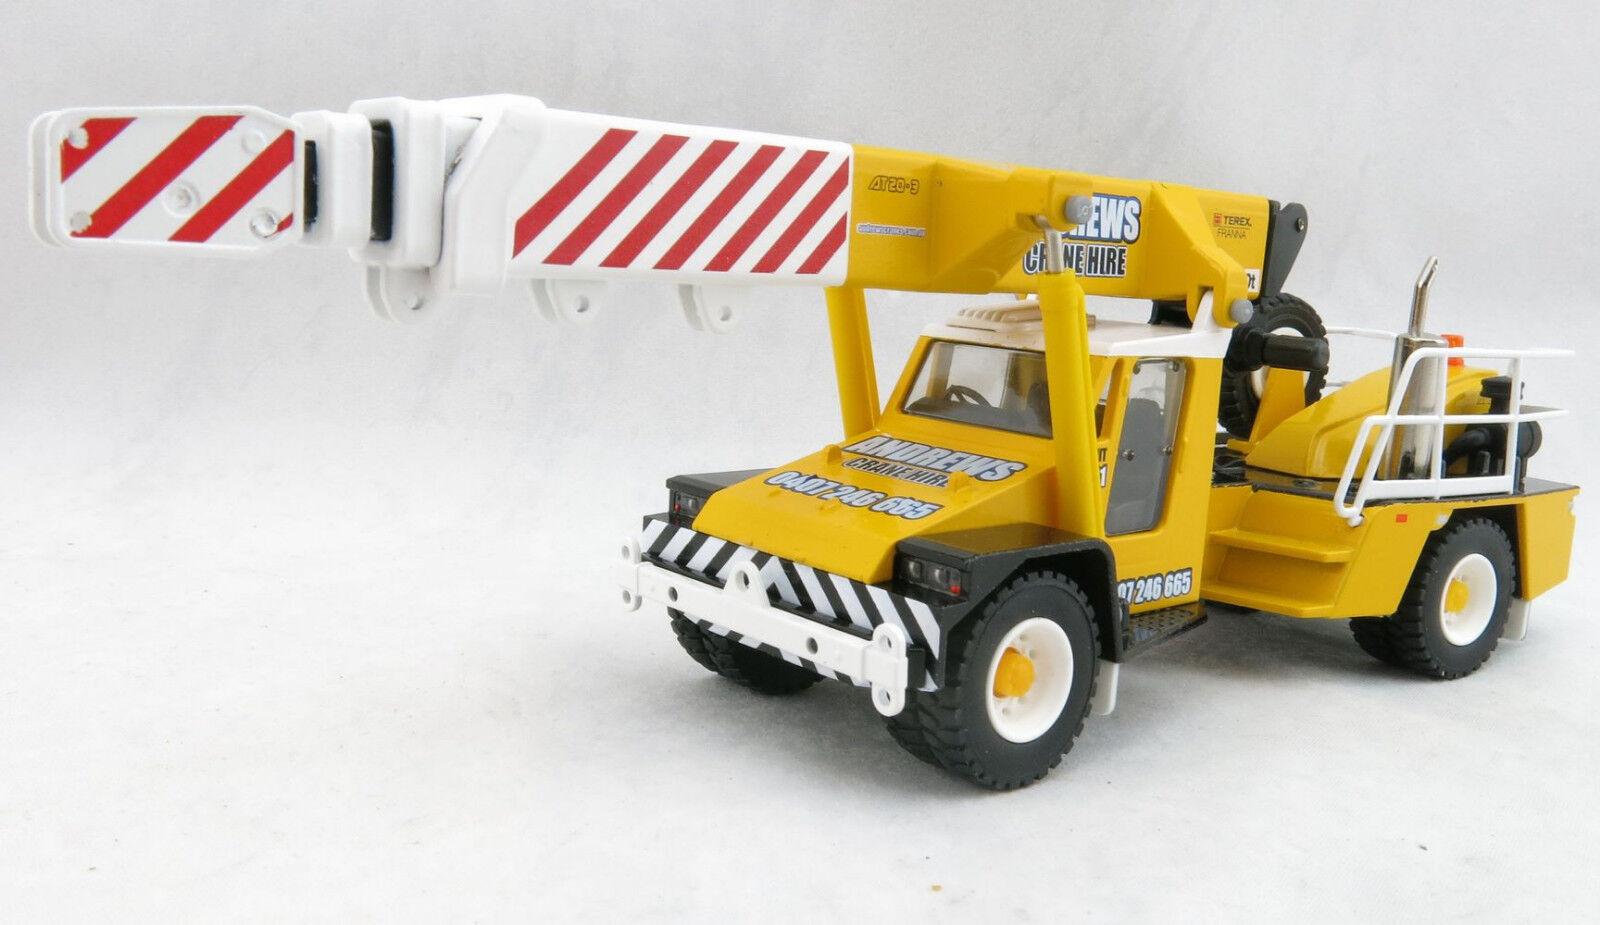 Conrad 2113 11 Australian Terex AT20 Franna Mobile Crane Andrews Crane Hire 1 50